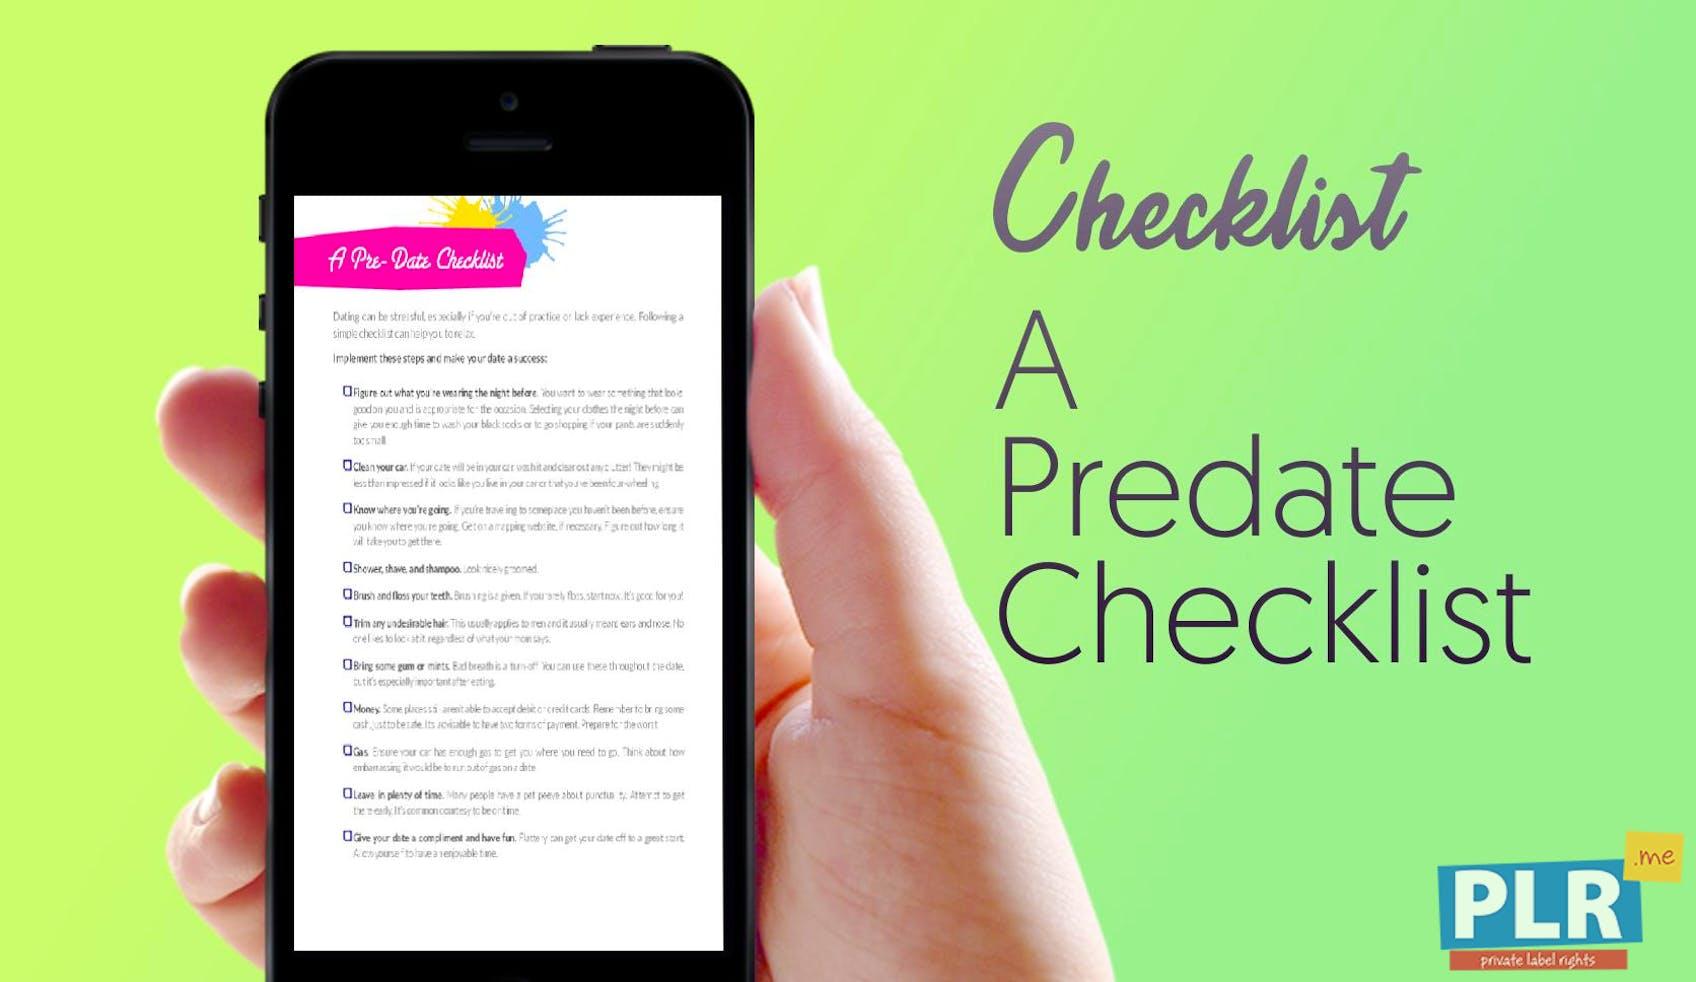 A Predate Checklist